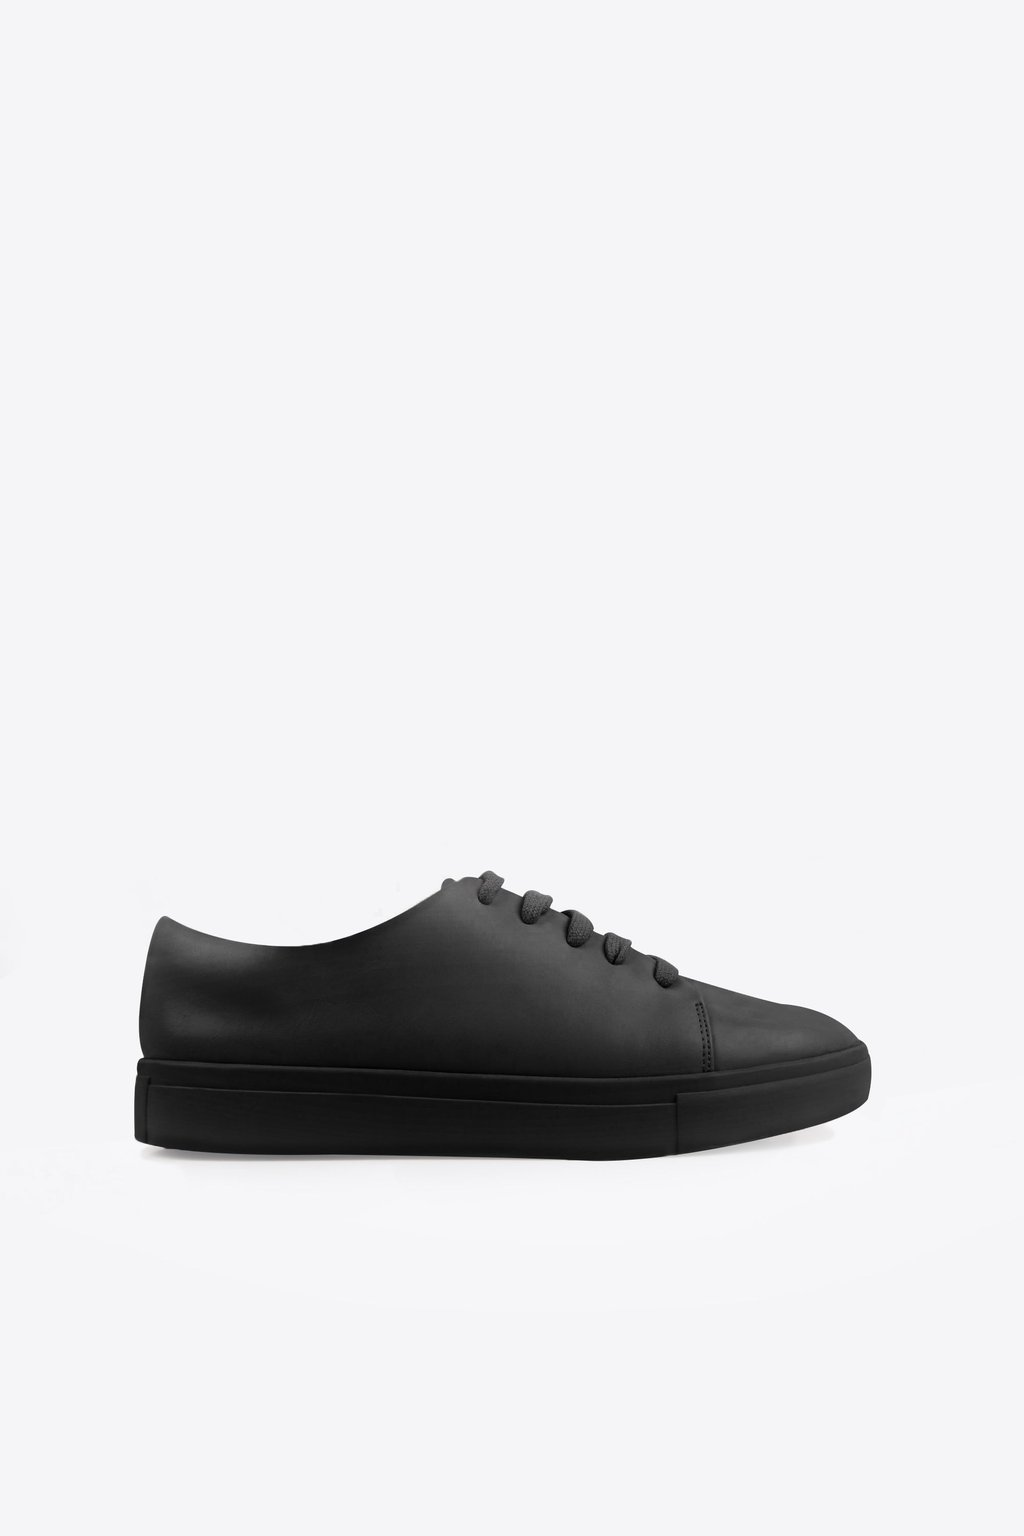 Sneaker 1339 Black 9